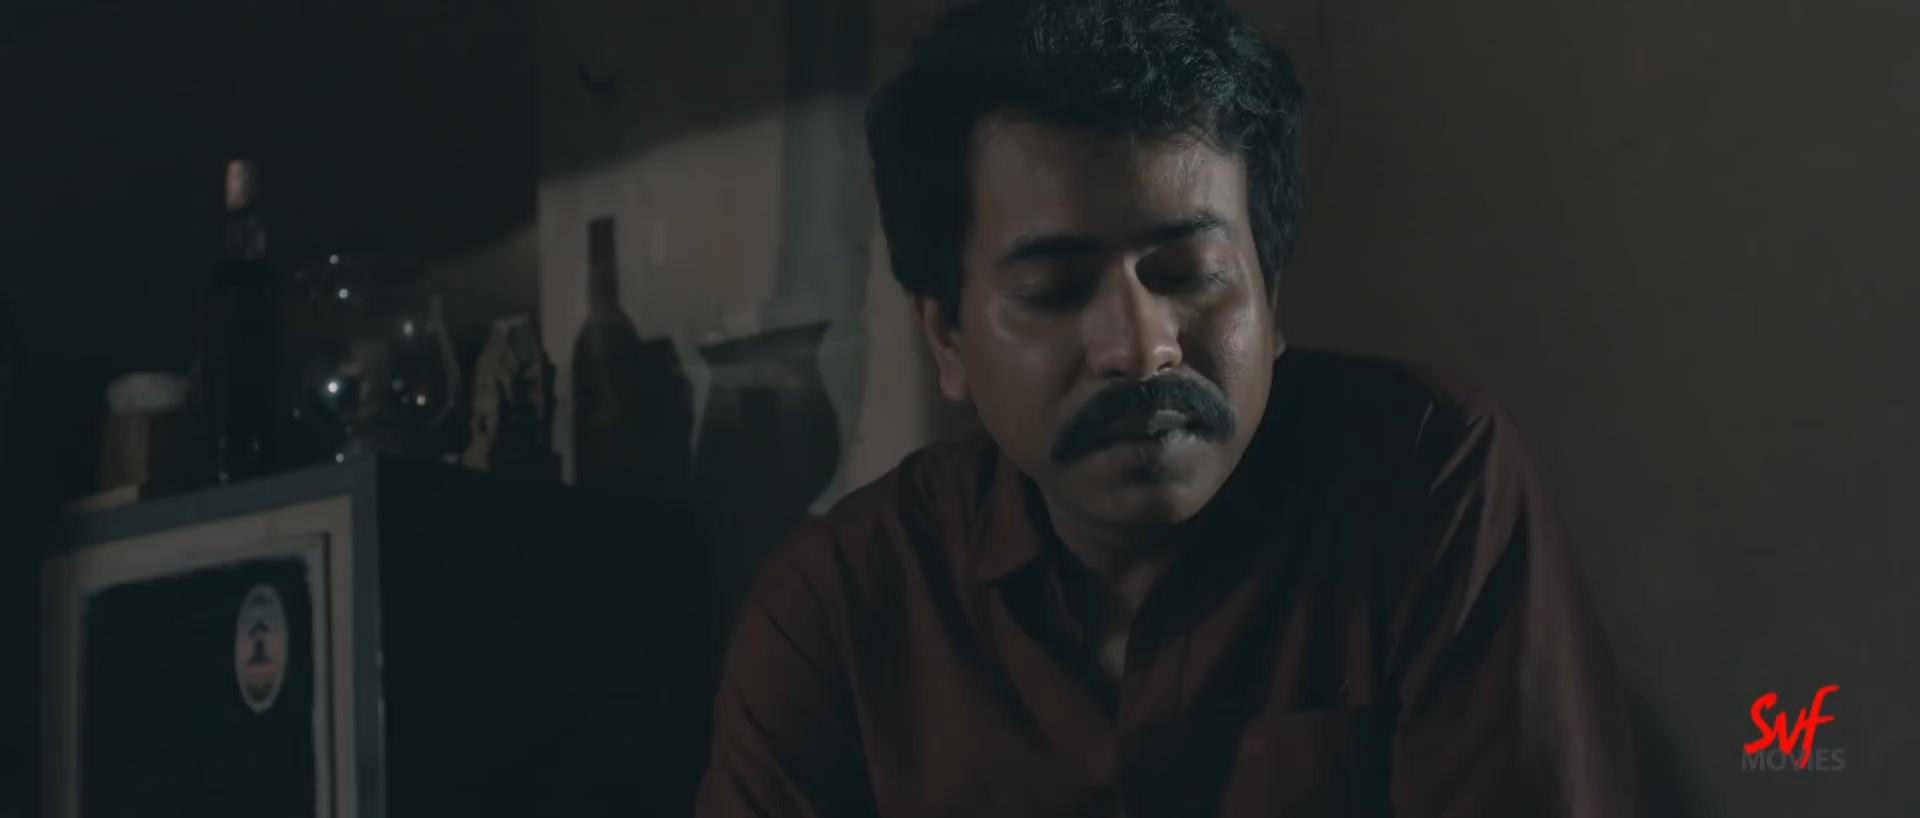 Zombiesthaan 2021 Full Bengali Film.mp4 snapshot 00.32.54.000